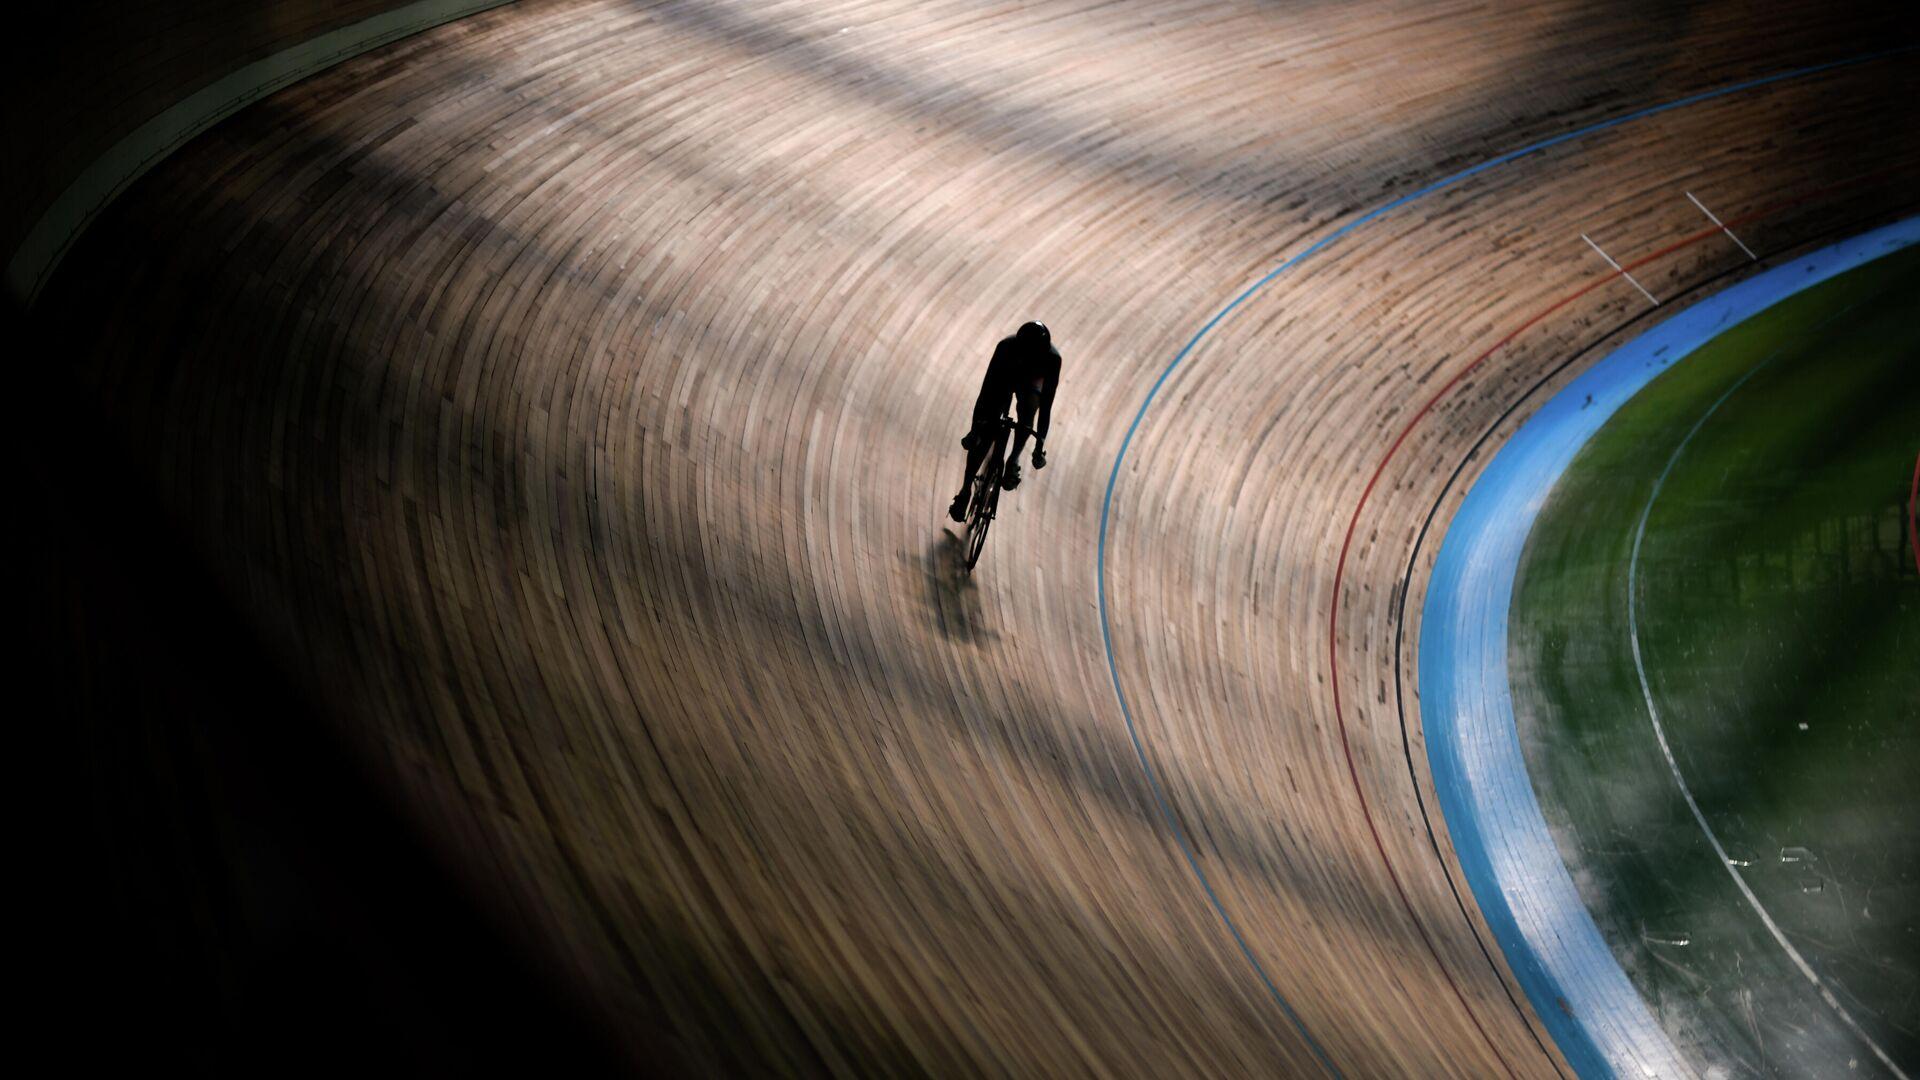 Велоспорт. Трек. Мемориал им. А. Лесникова - РИА Новости, 1920, 30.10.2020